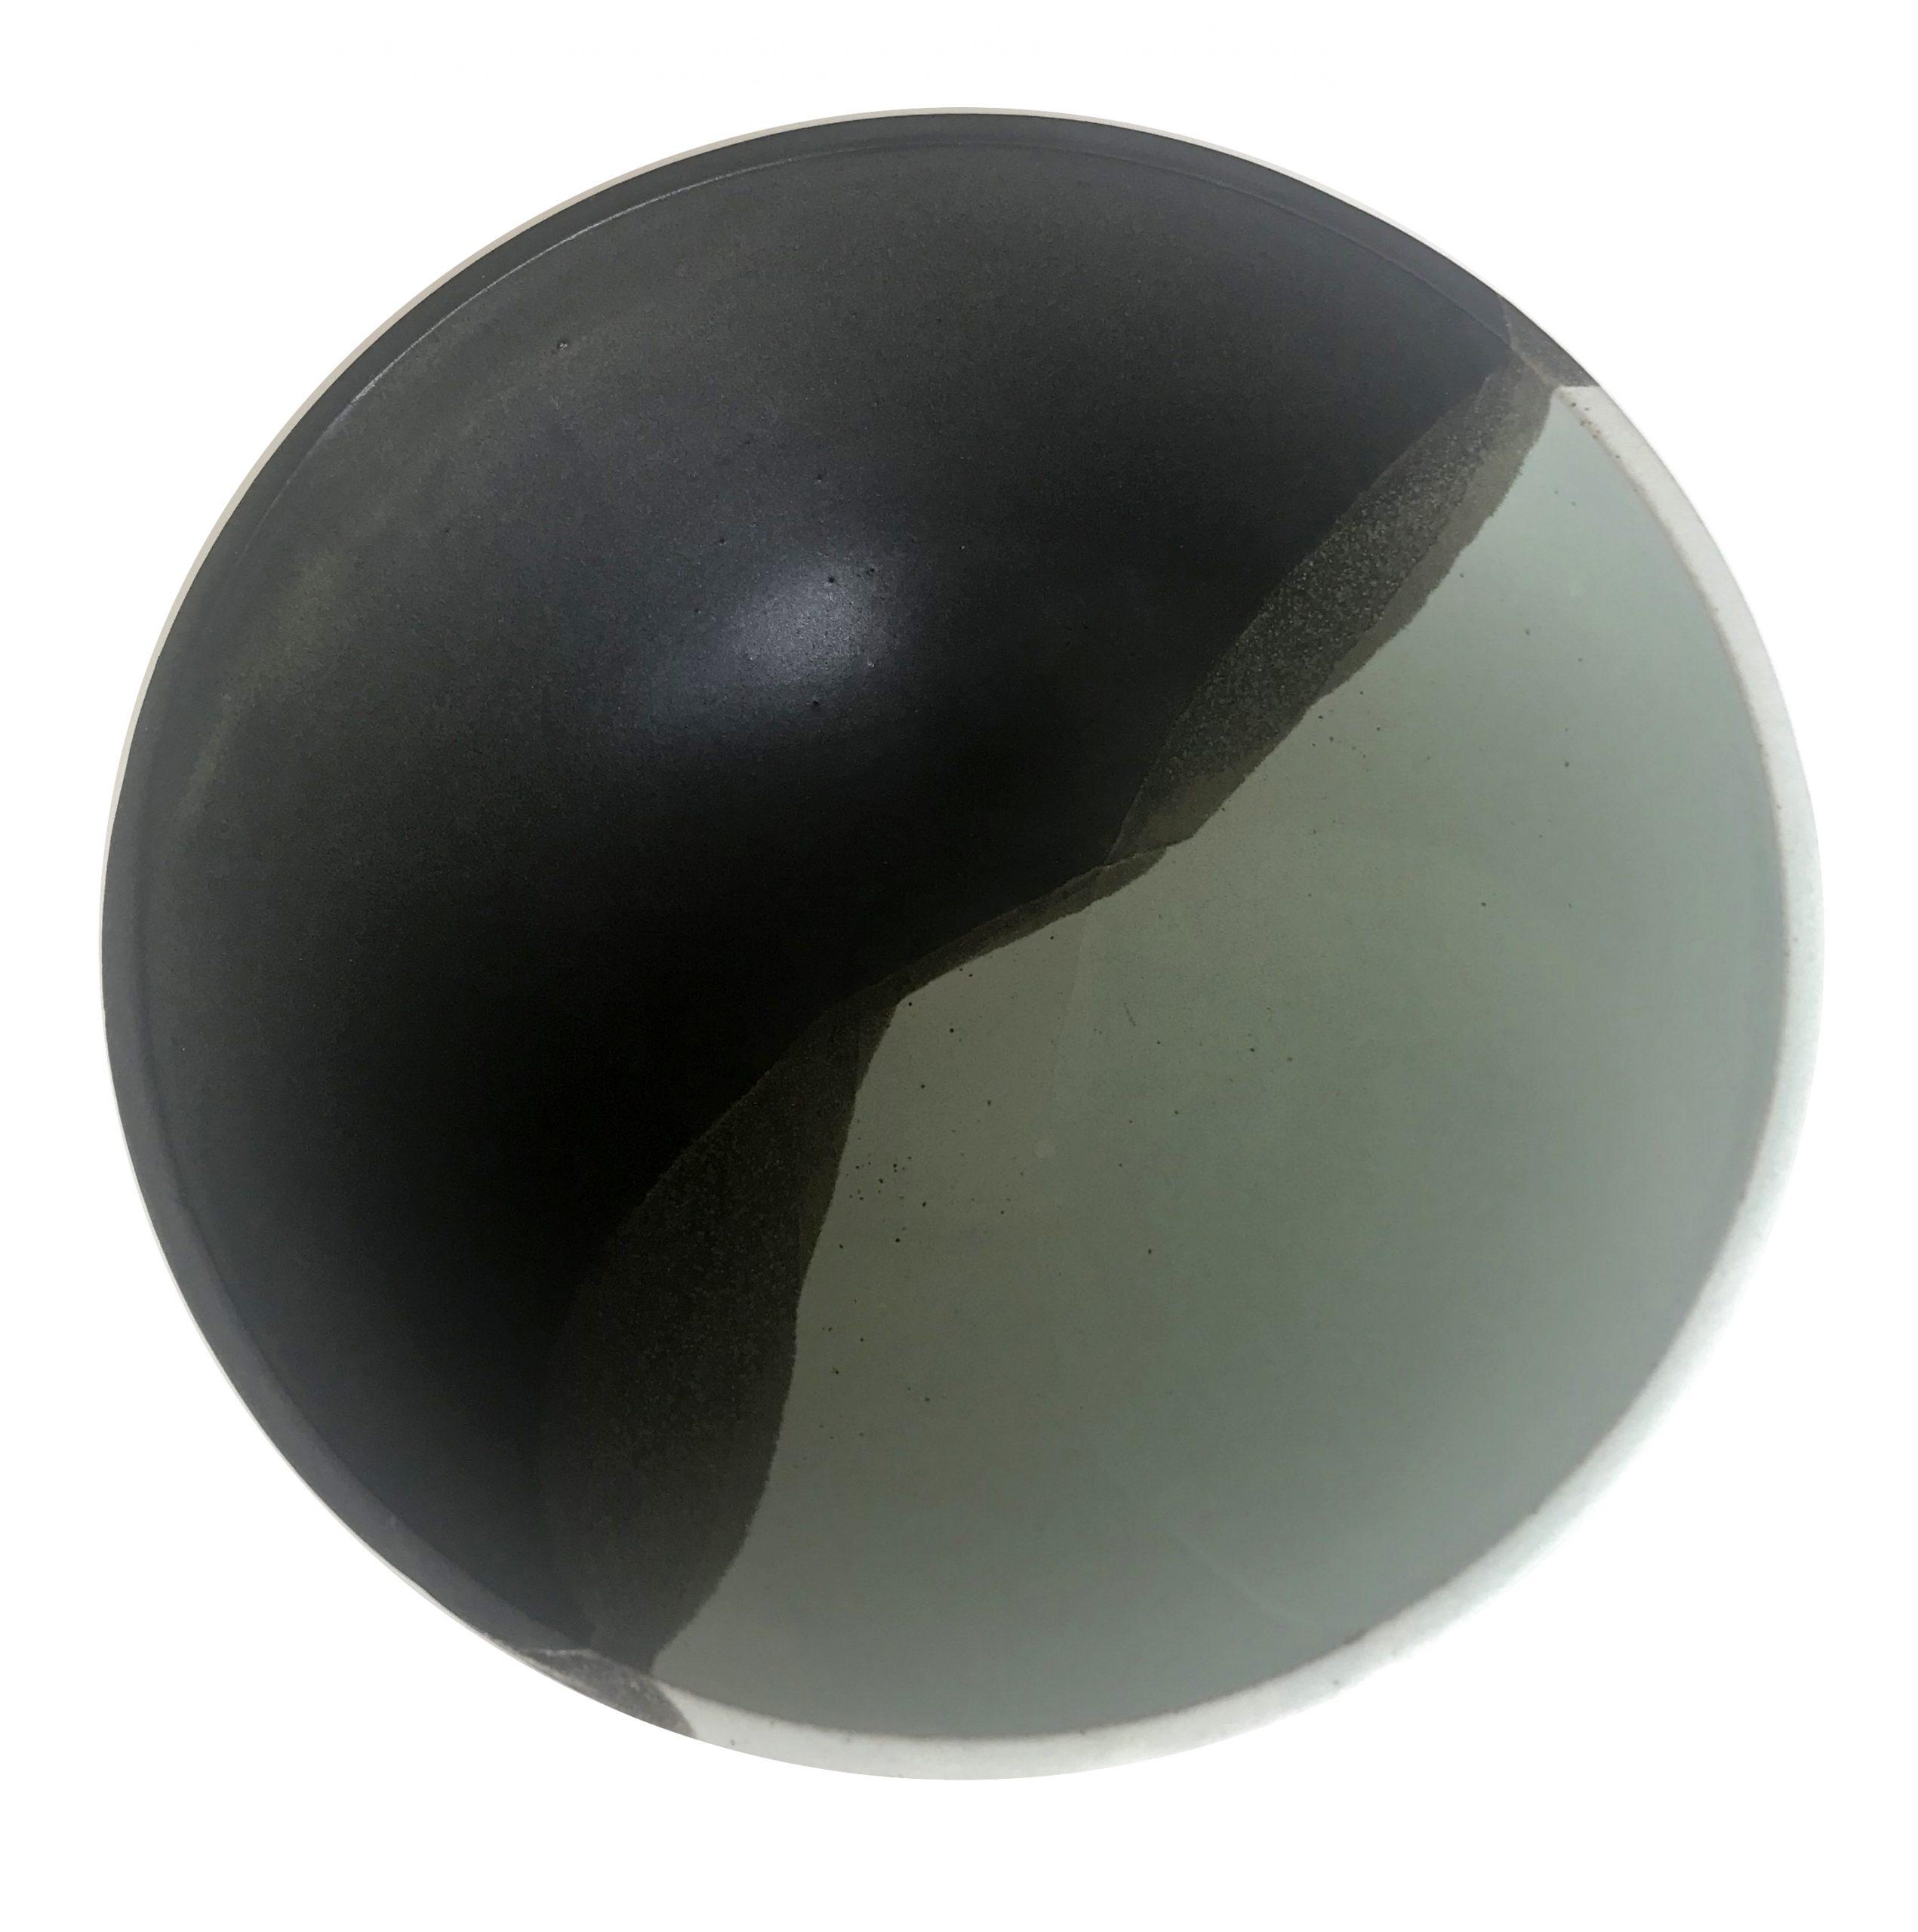 Phaedra Kouseli | Ceramic bowl | £100